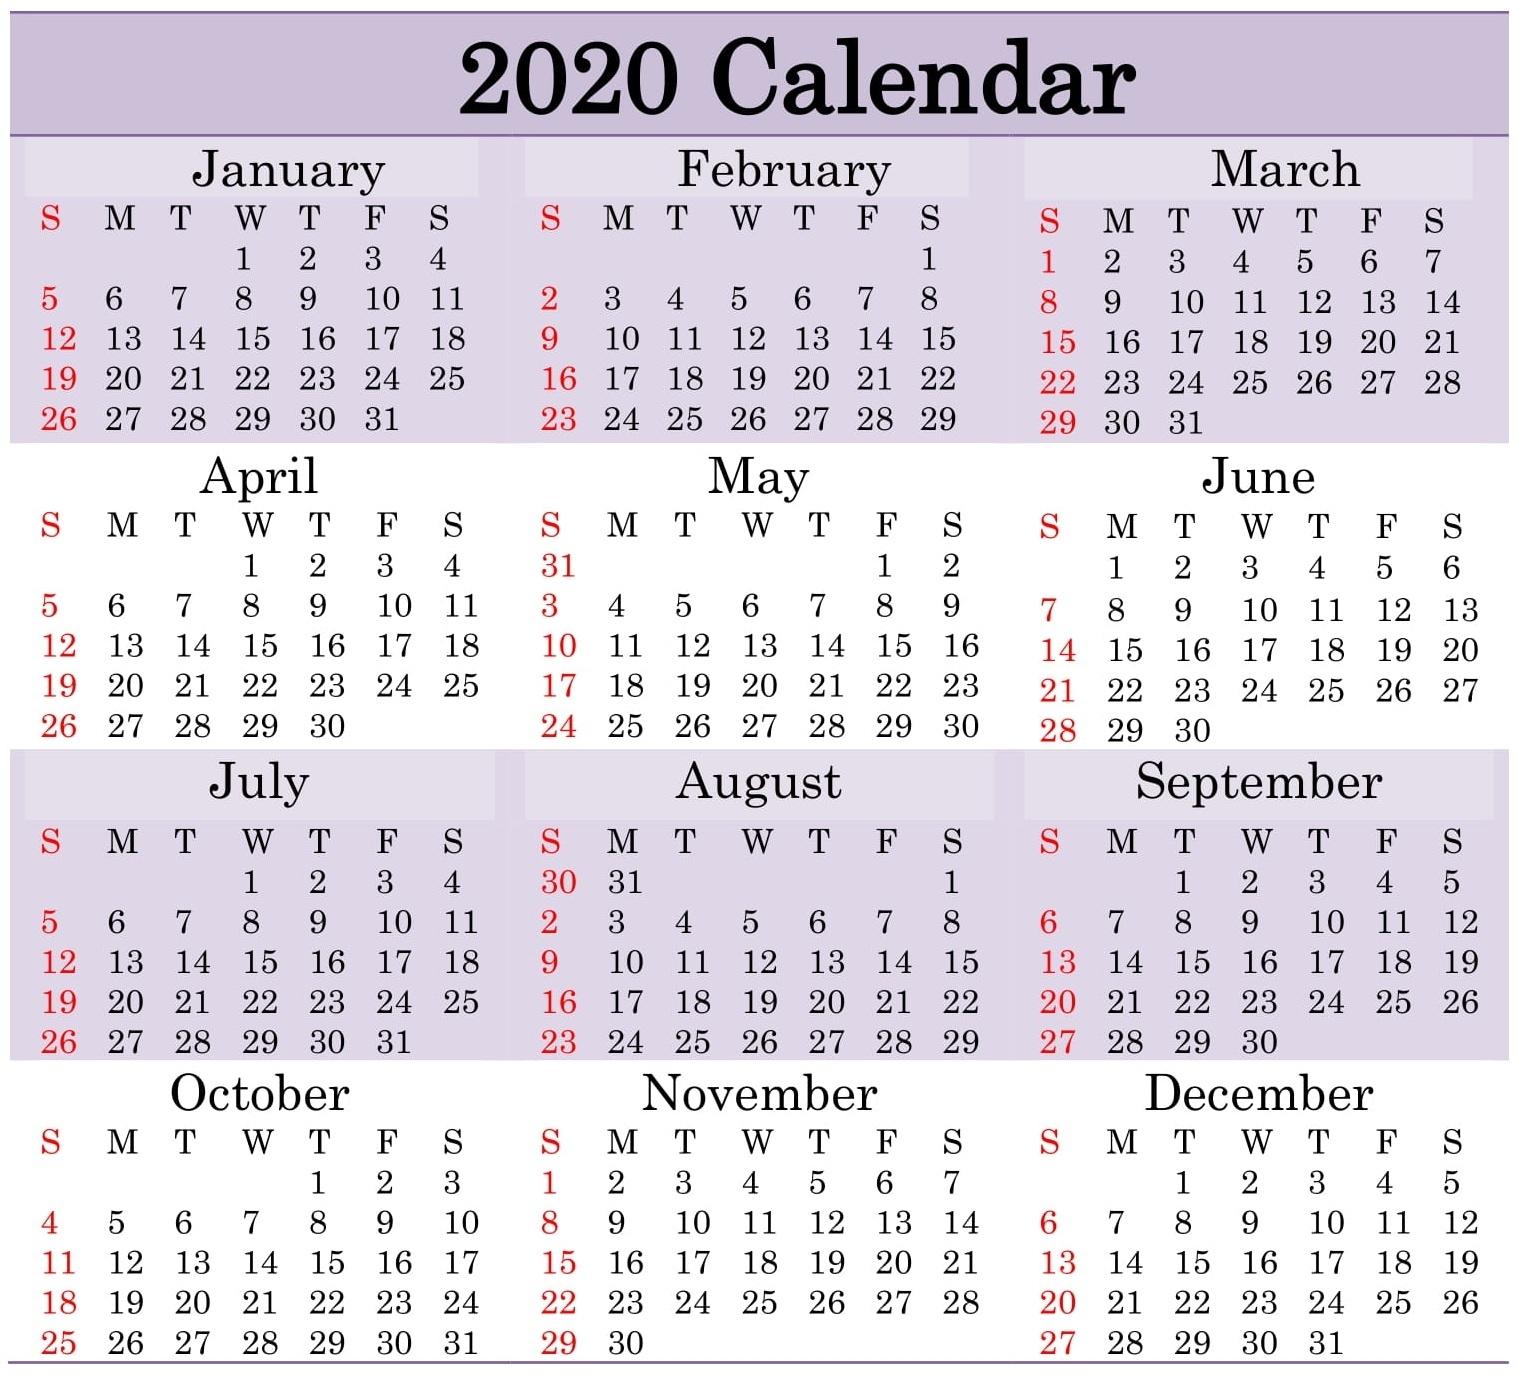 Printable 2020 Calendar Word Document - Latest Printable with regard to Julian Calendar Leap Year Printable